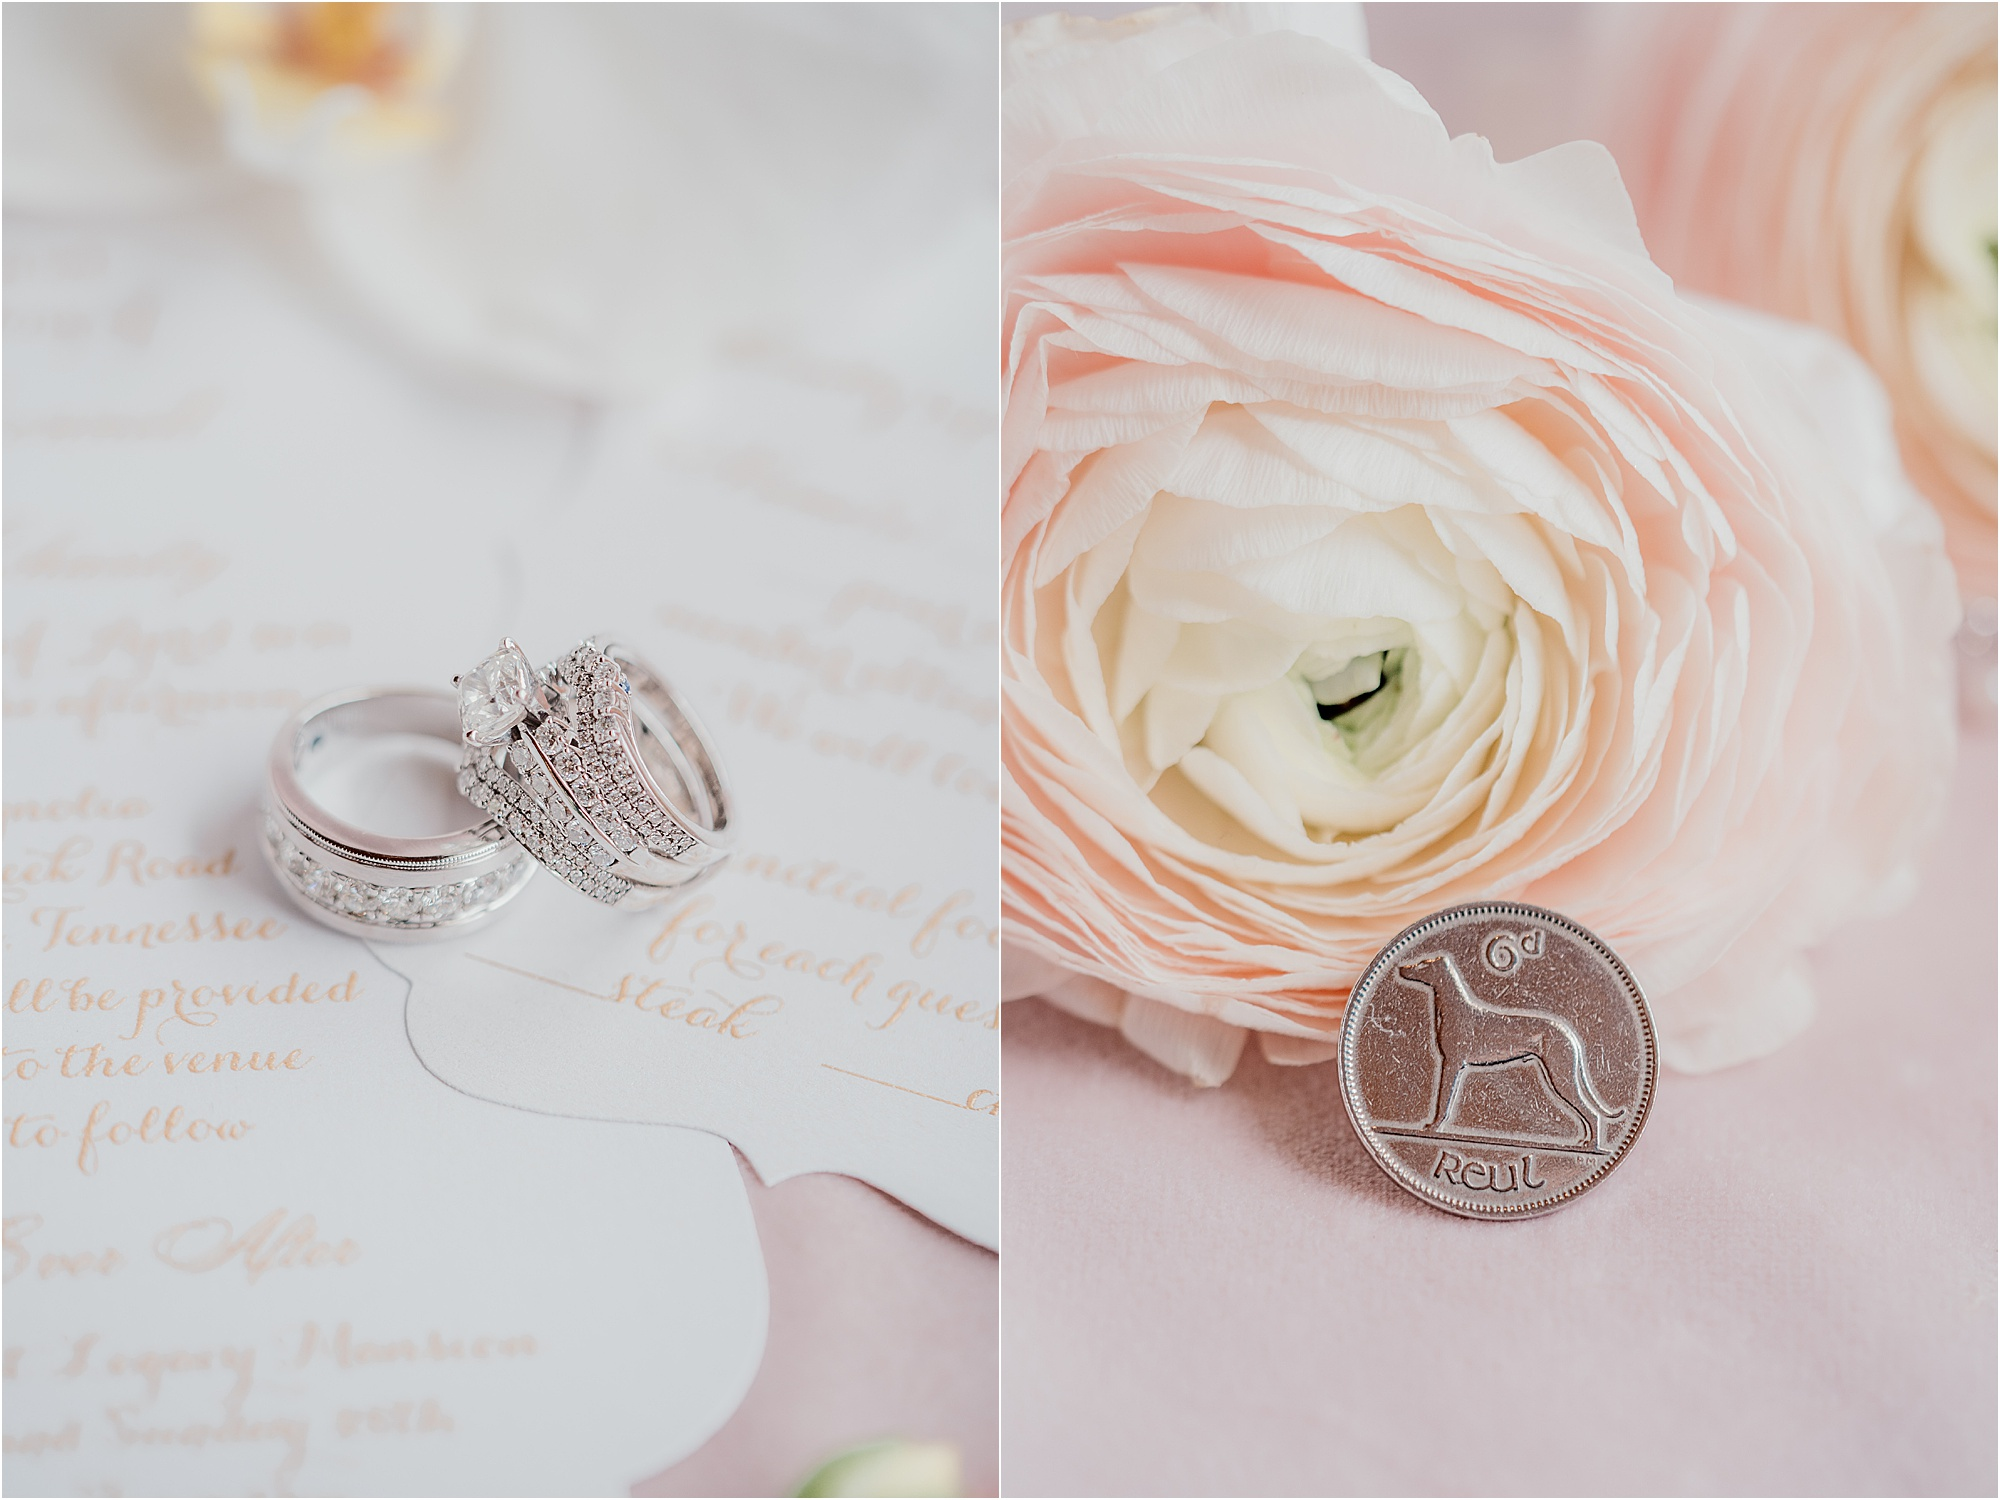 large wedding rings next to six pence on wedding day